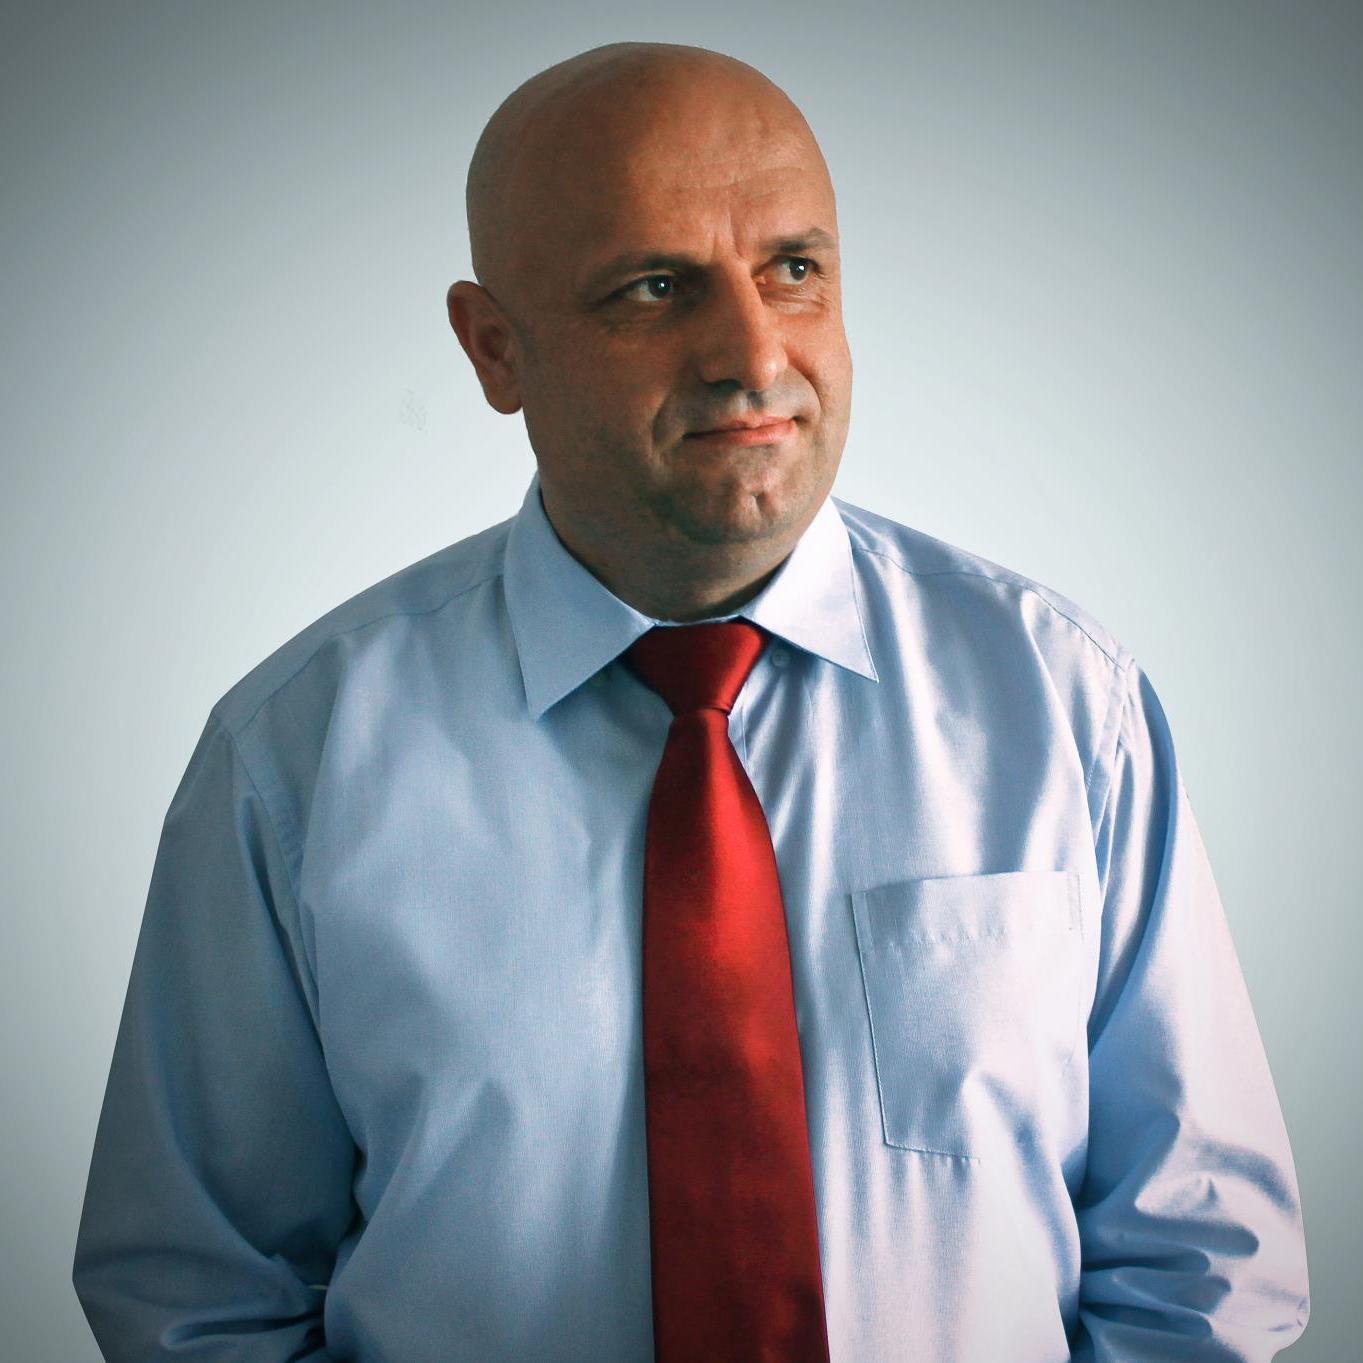 Dr. Ahmet Maloku